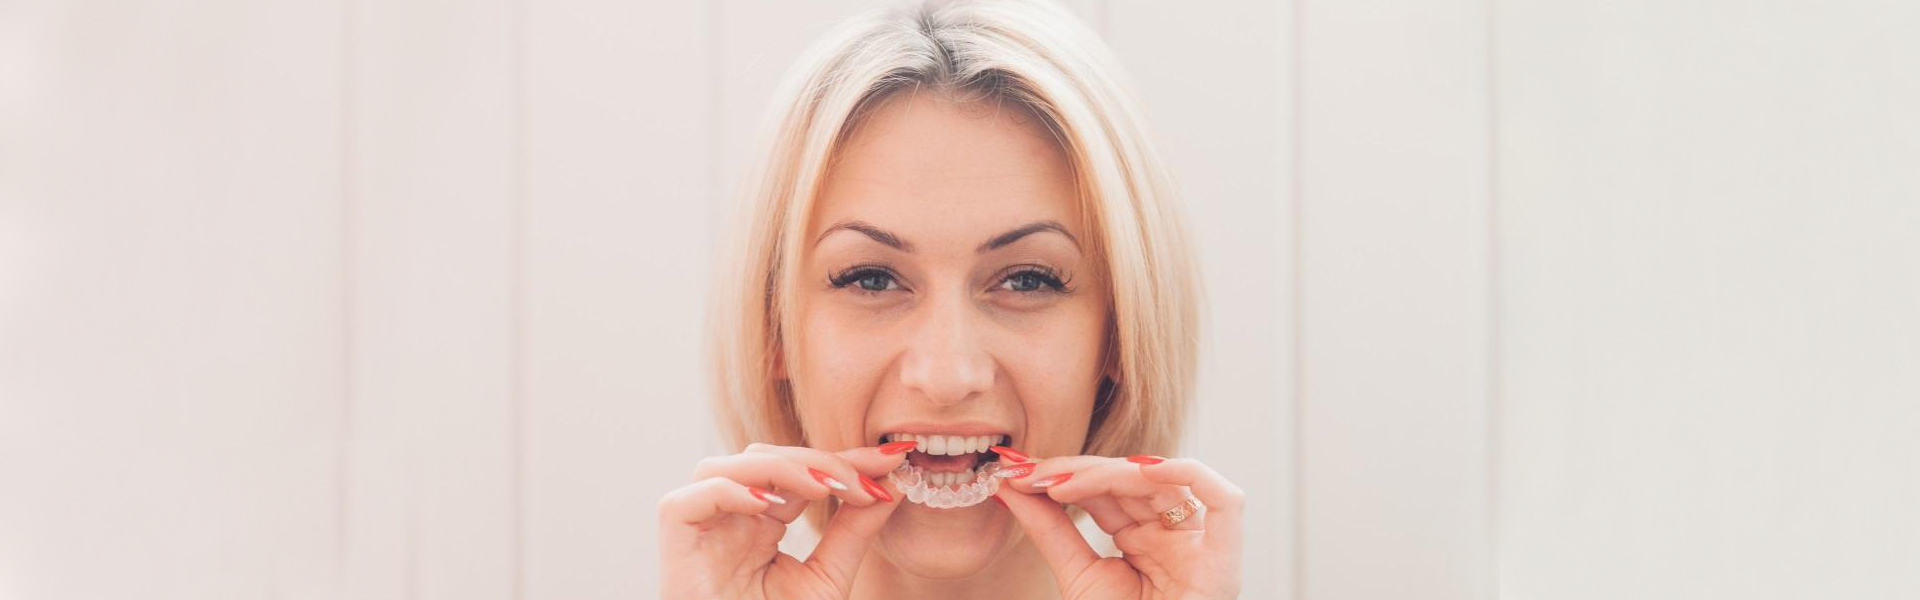 Teeth Straightening Convenient with Discreet Invisalign Braces